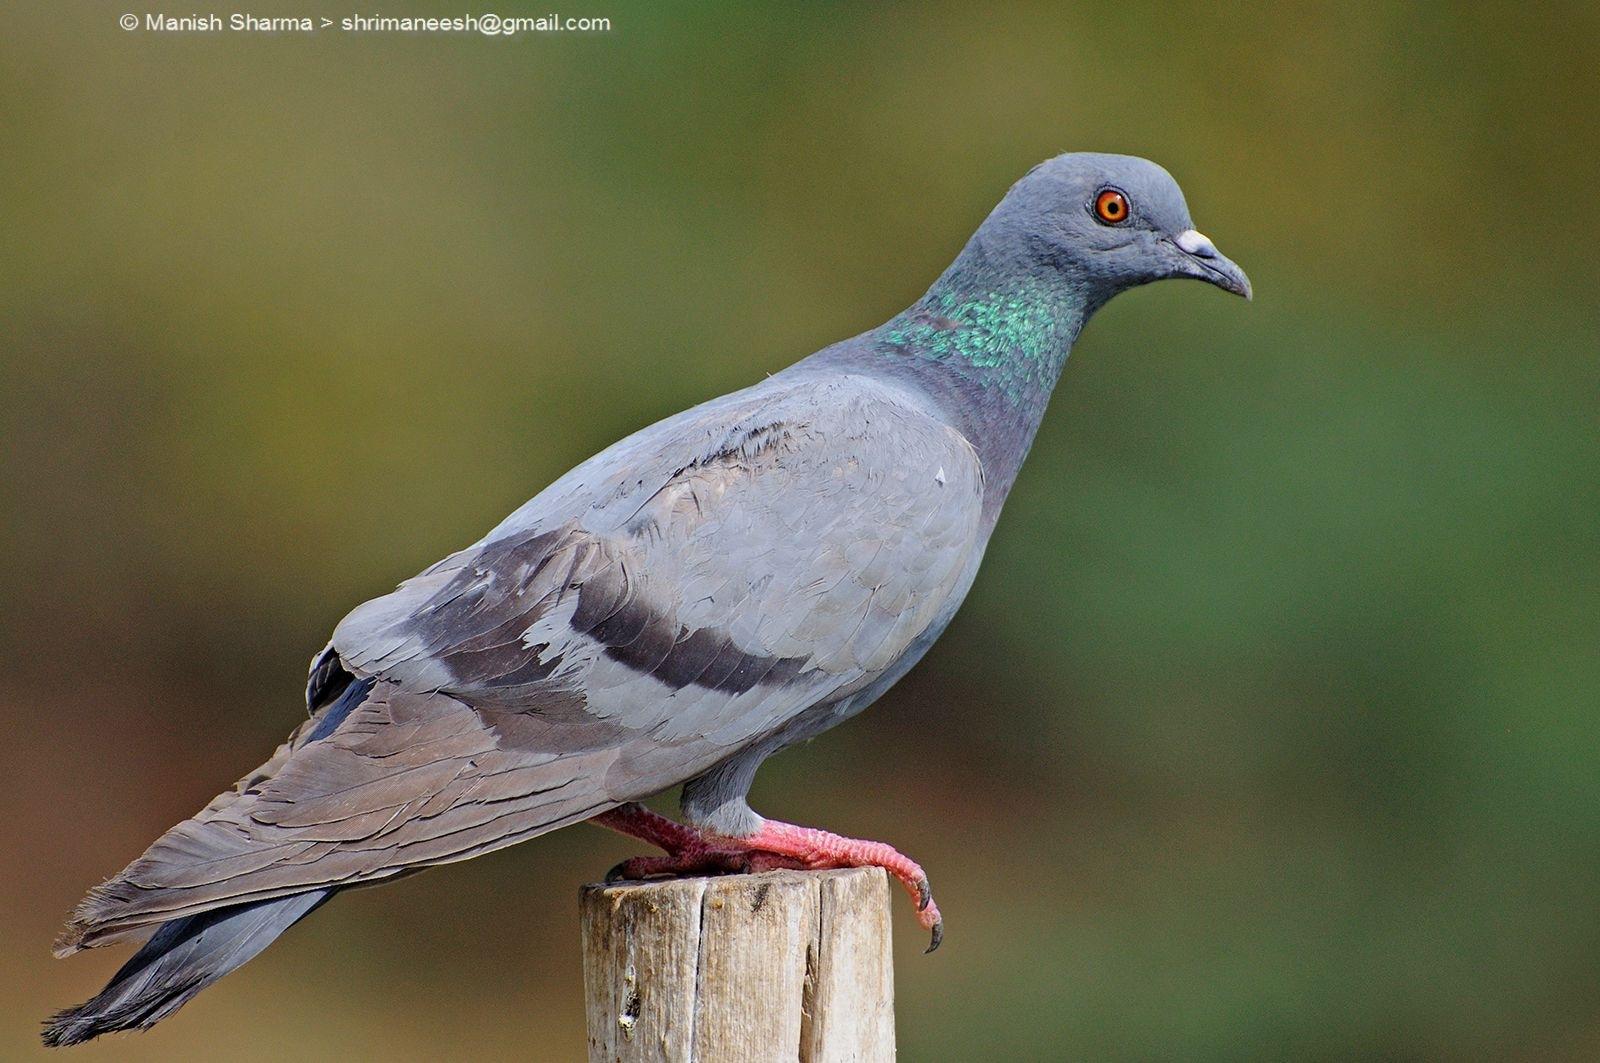 Blue Rock Pigeon …Scientific name: Columba livia by Maneesh Sharma